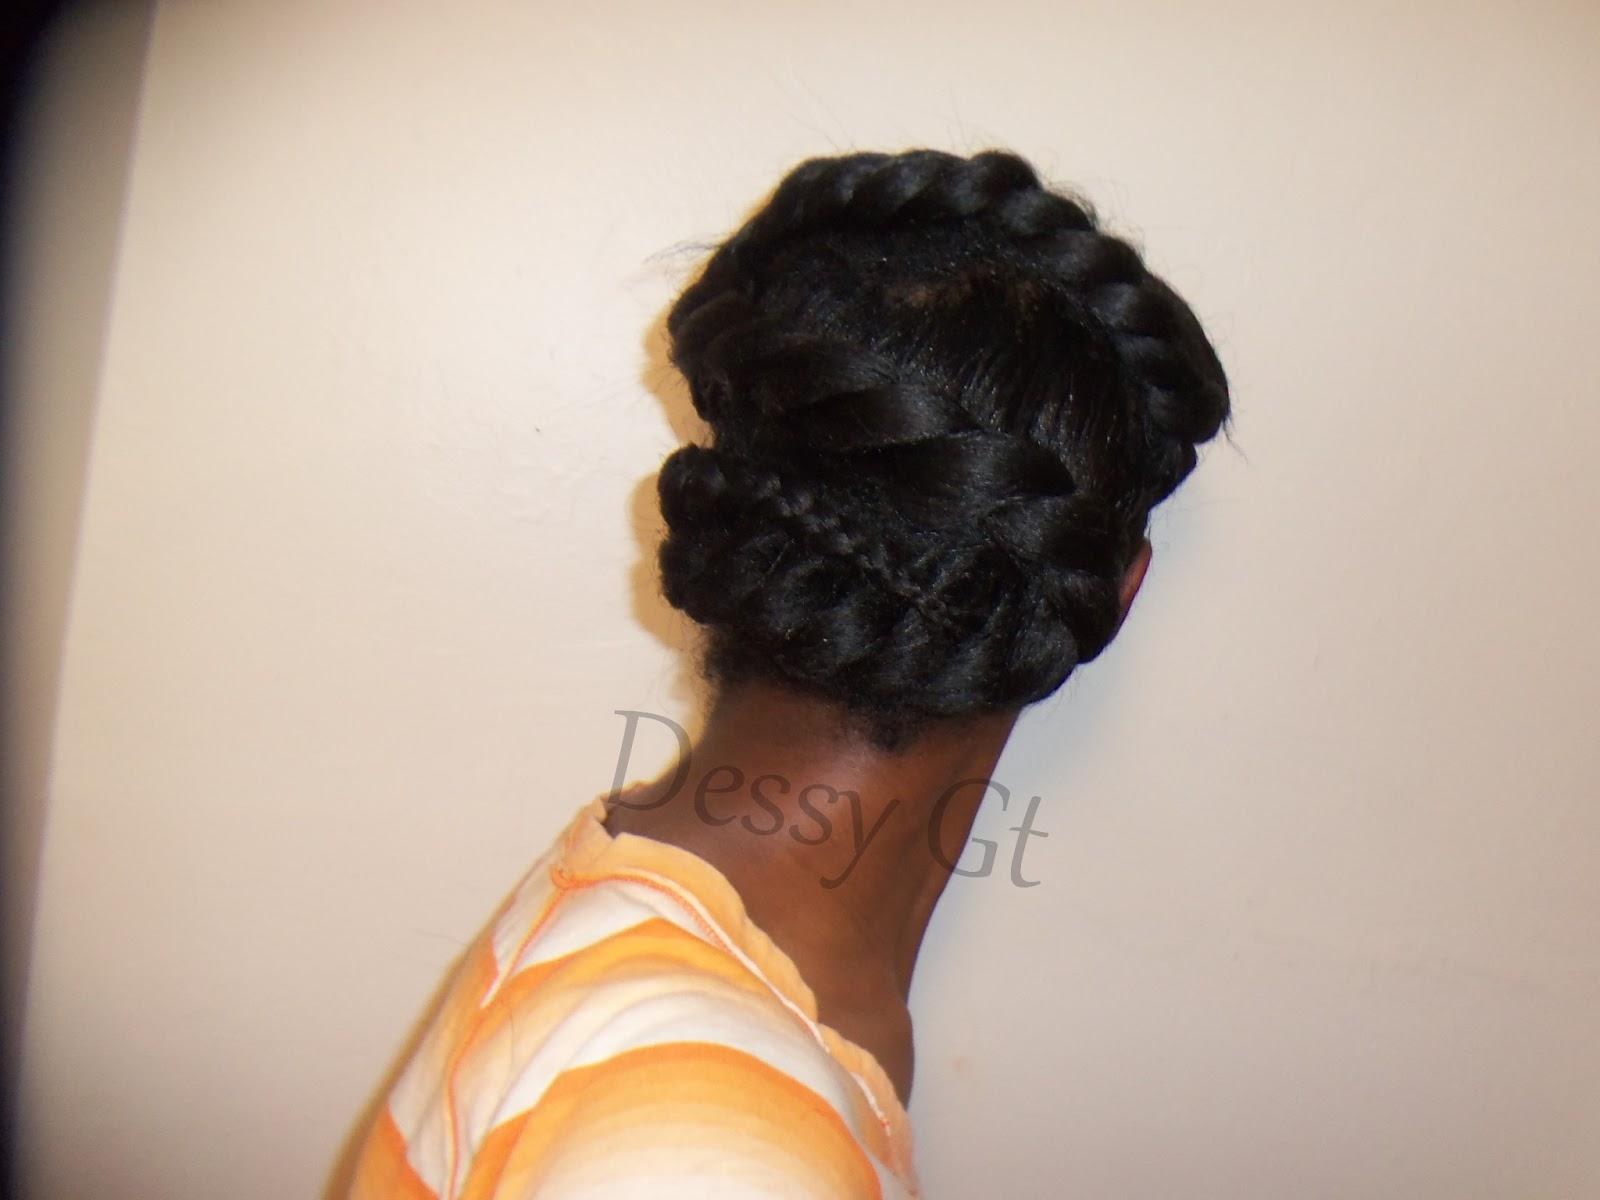 Dessyluvs: S Braid Relaxed Hair